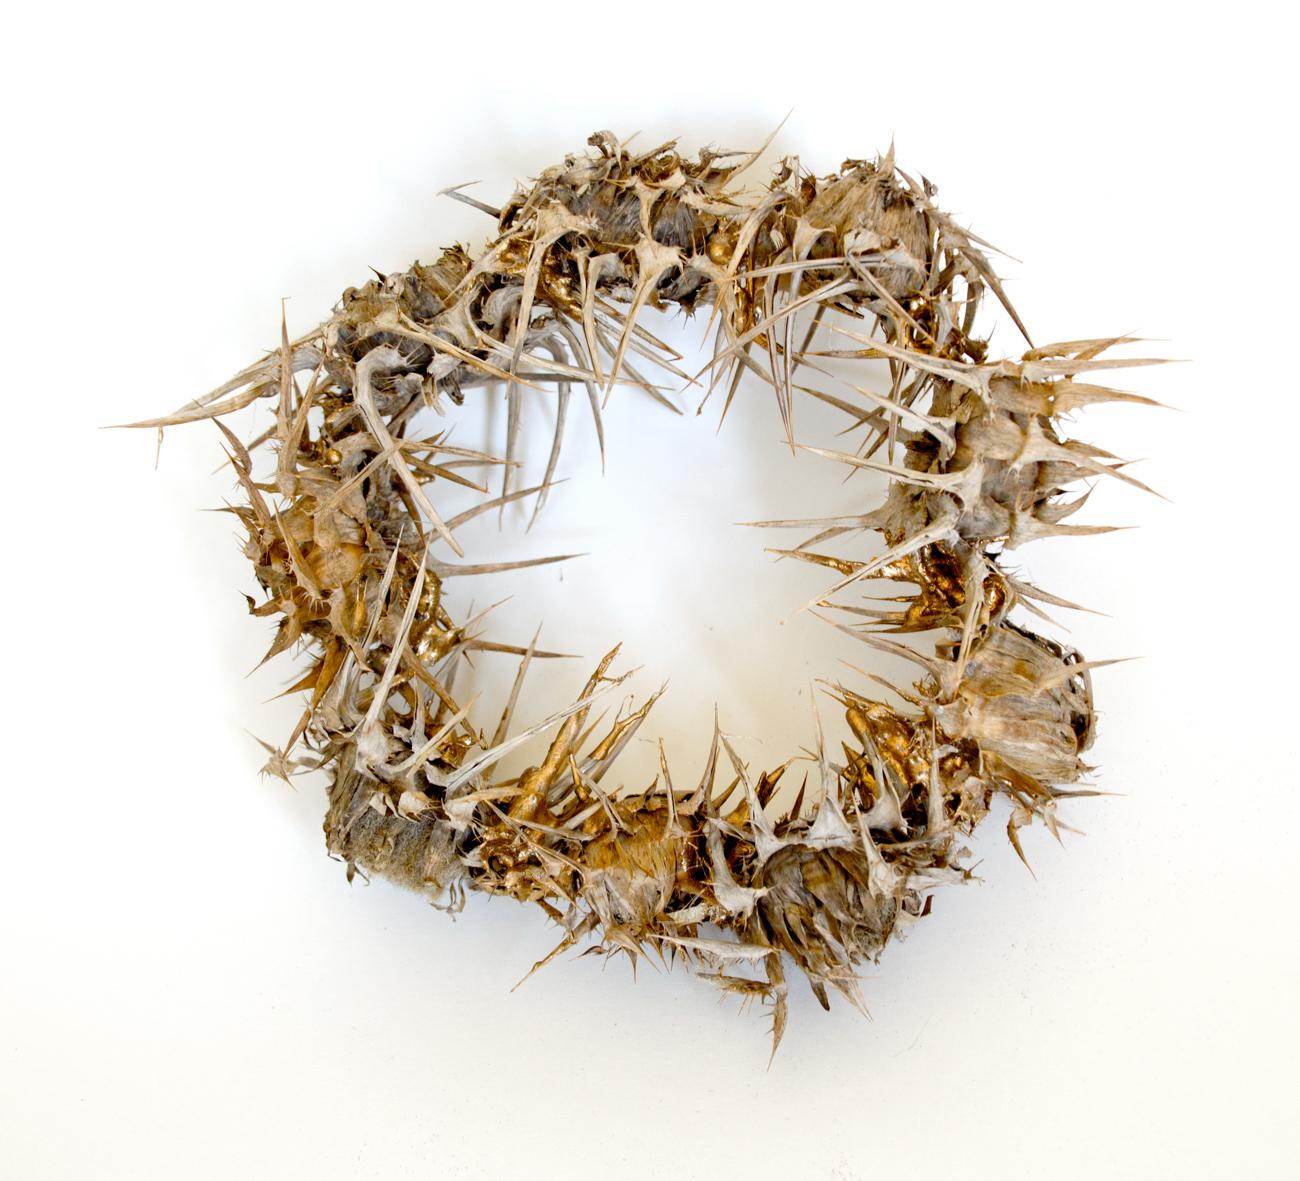 Adalaad Wreath_Memorabilia 01.jpg